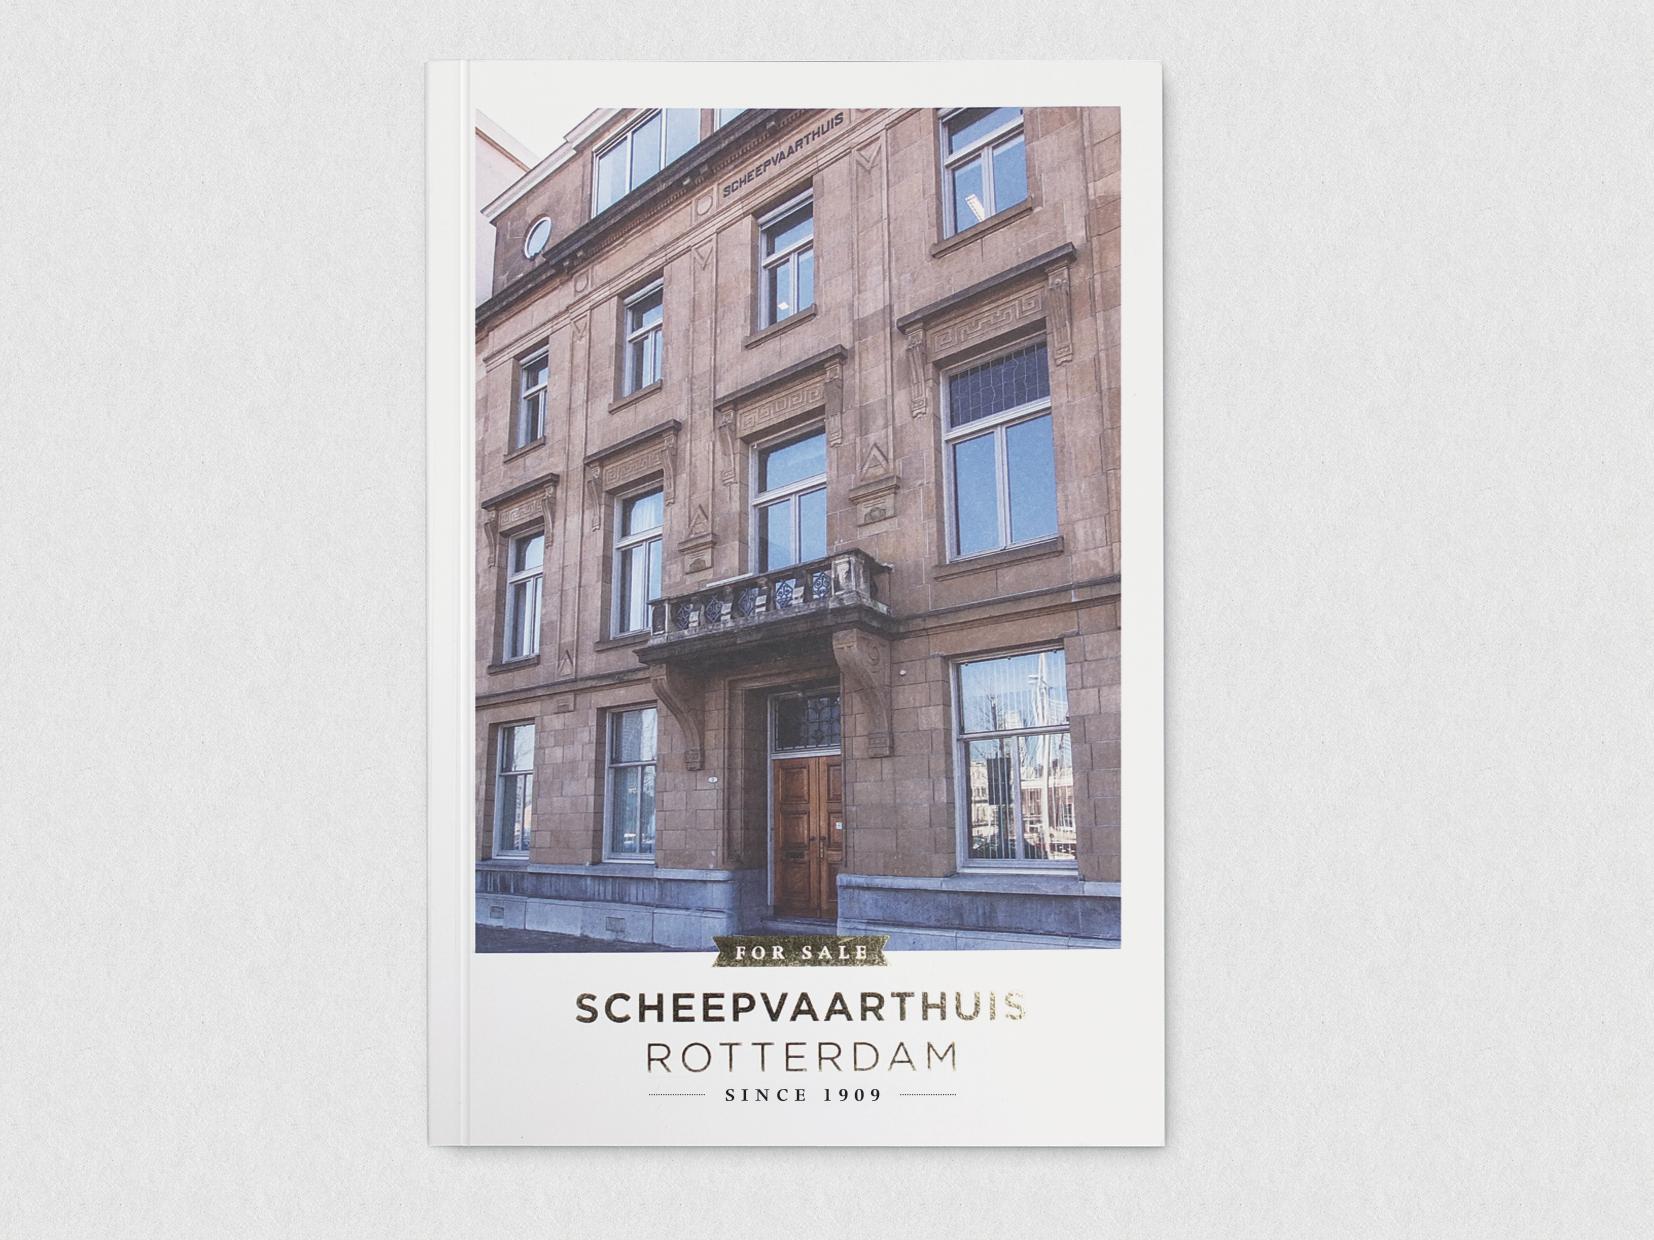 wouke_scheepvaarthuis_cover.jpg